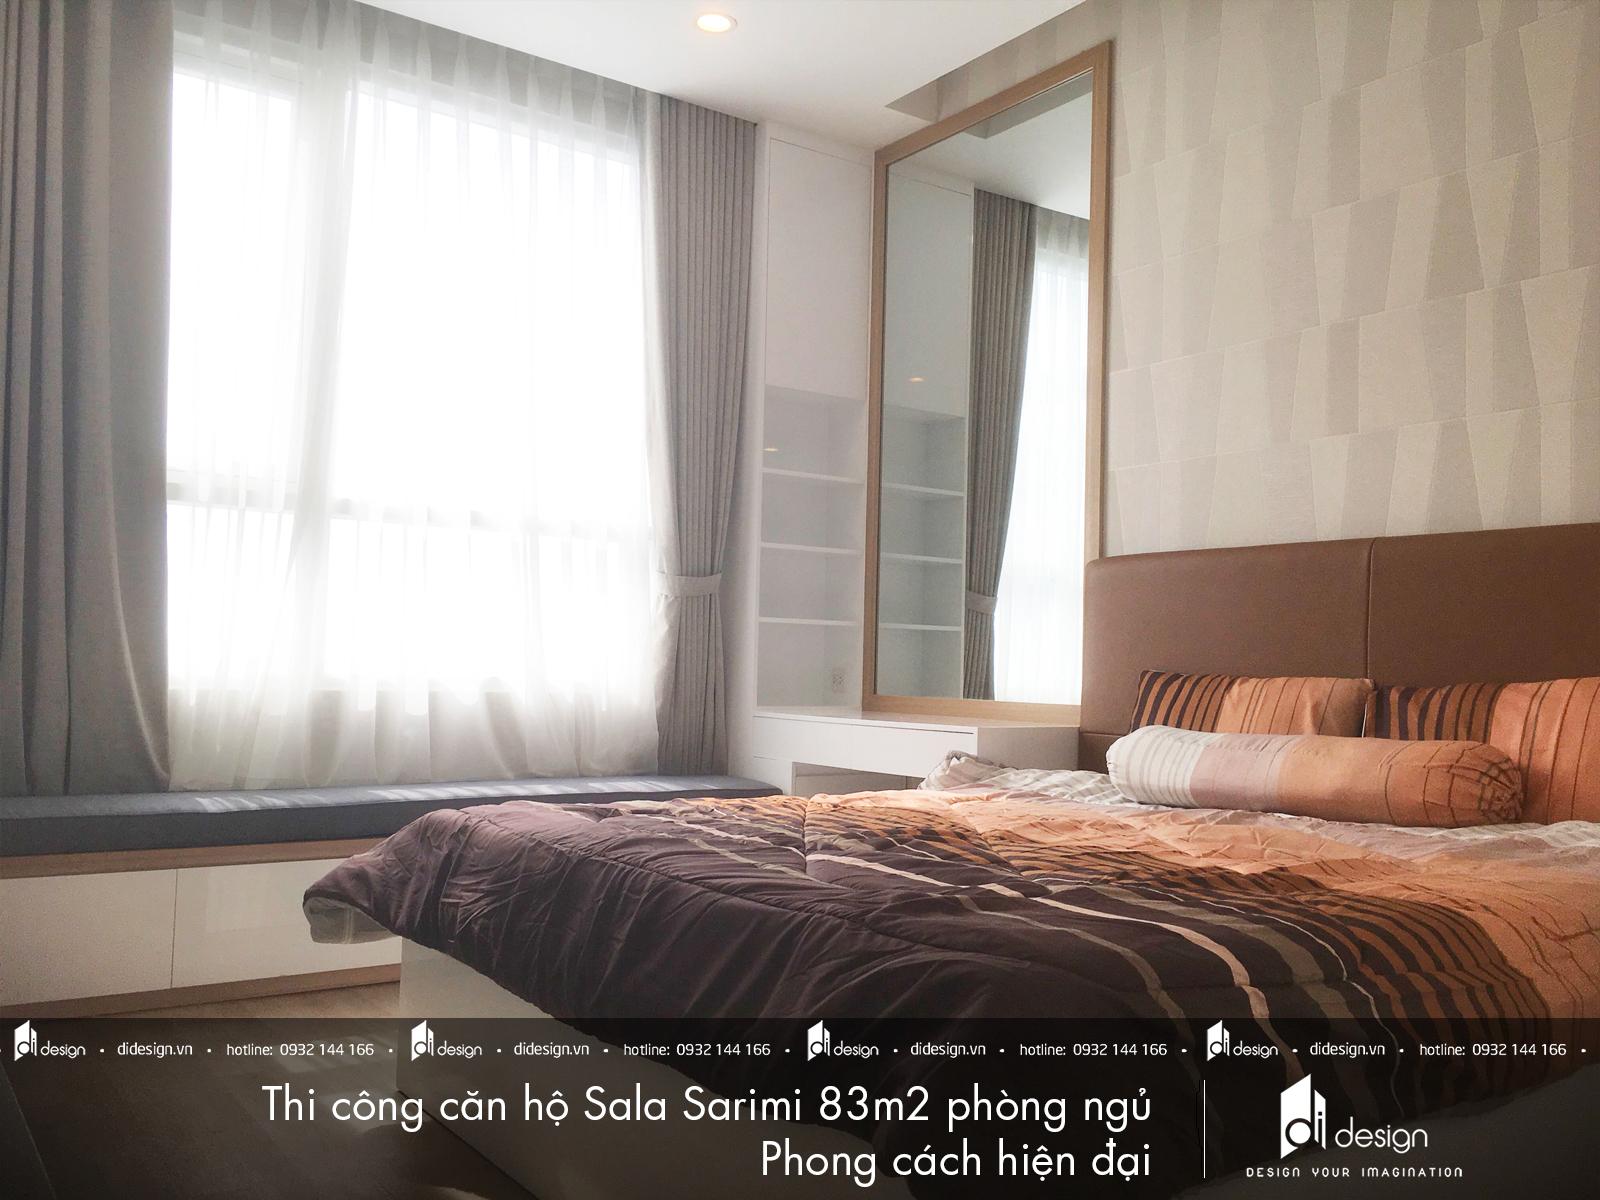 thi-cong-noi-that-can-ho-Sala-Sarimi-83m2-8-phong-ngu.jpg